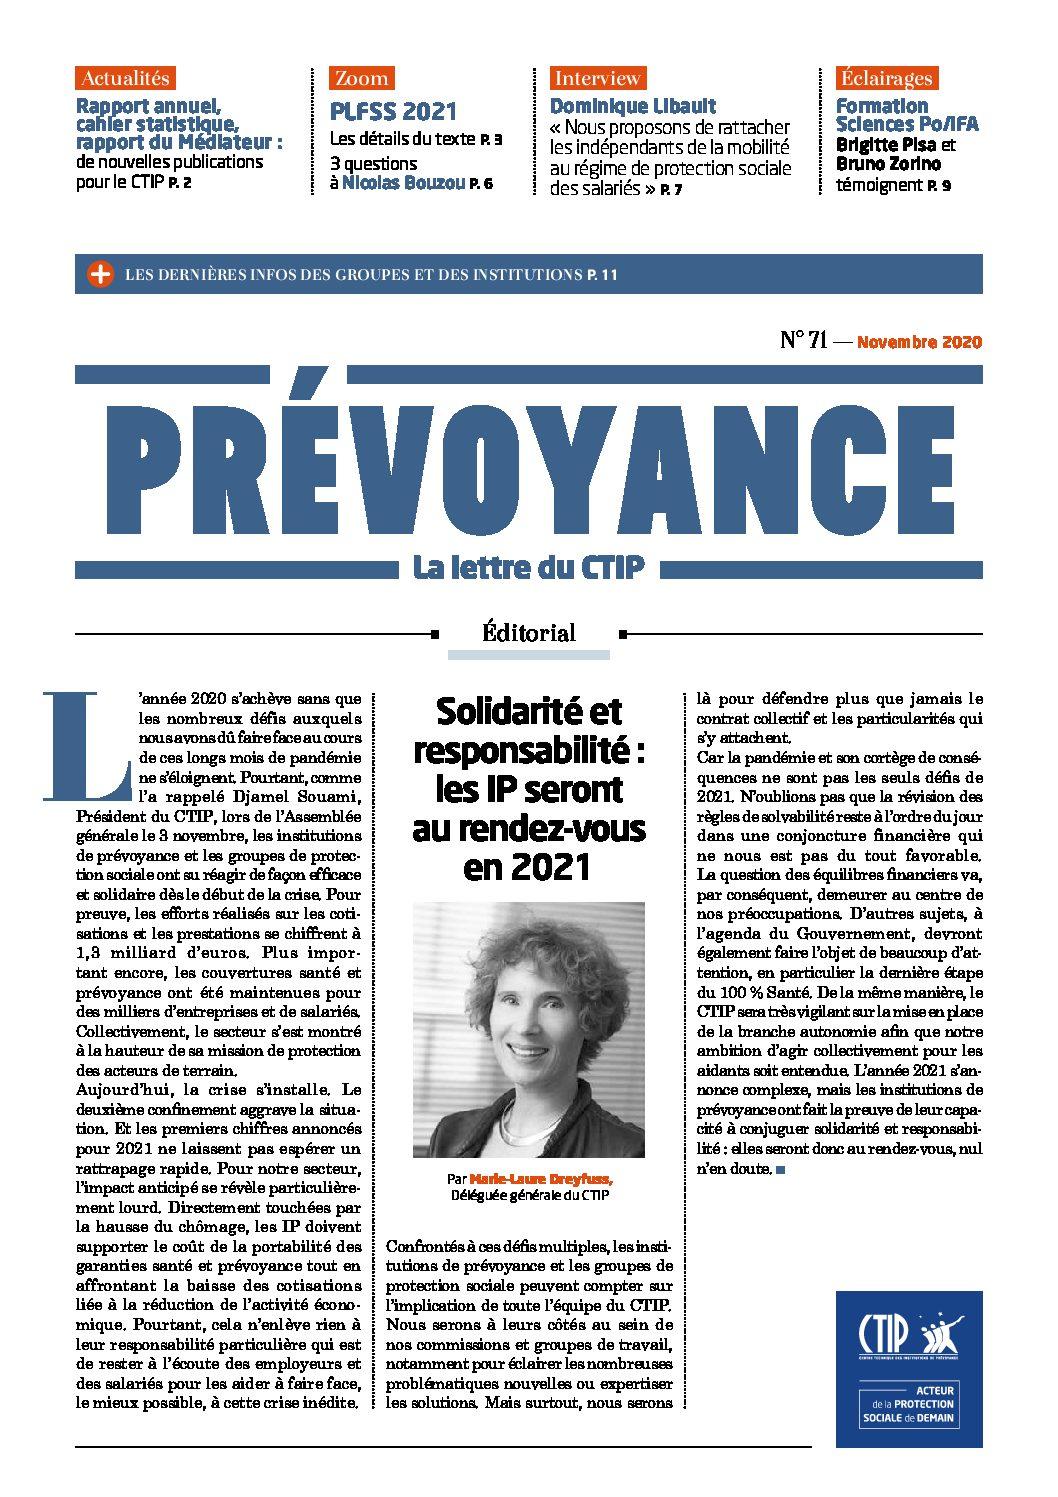 Prévoyance n°71 – Novembre 2020